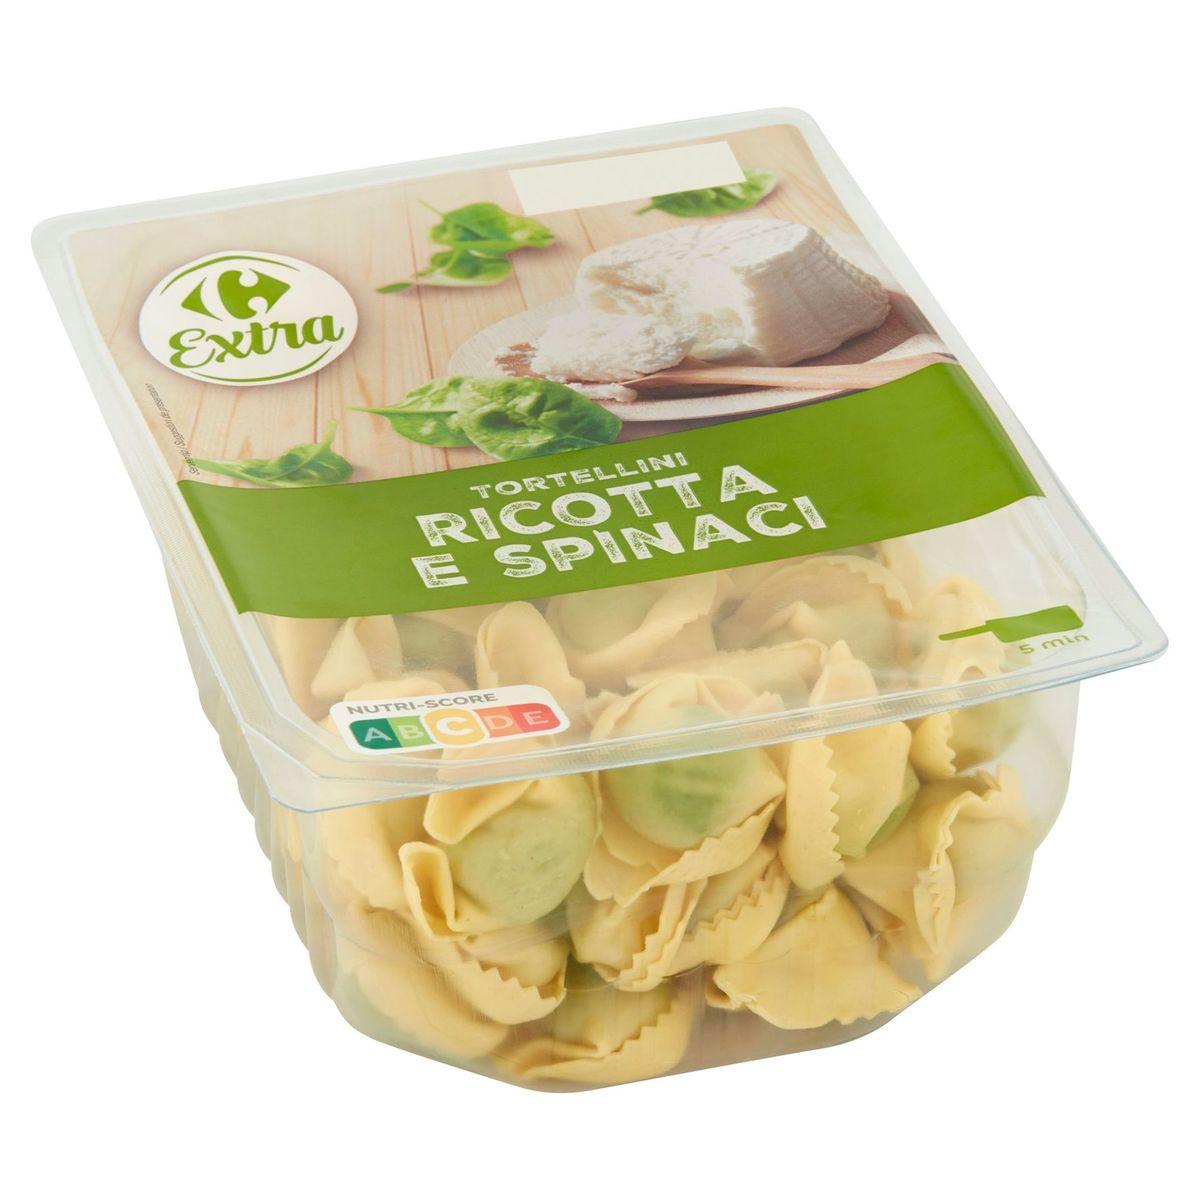 Carrefour Extra Tortellini Ricotta e Spinaci 500 g